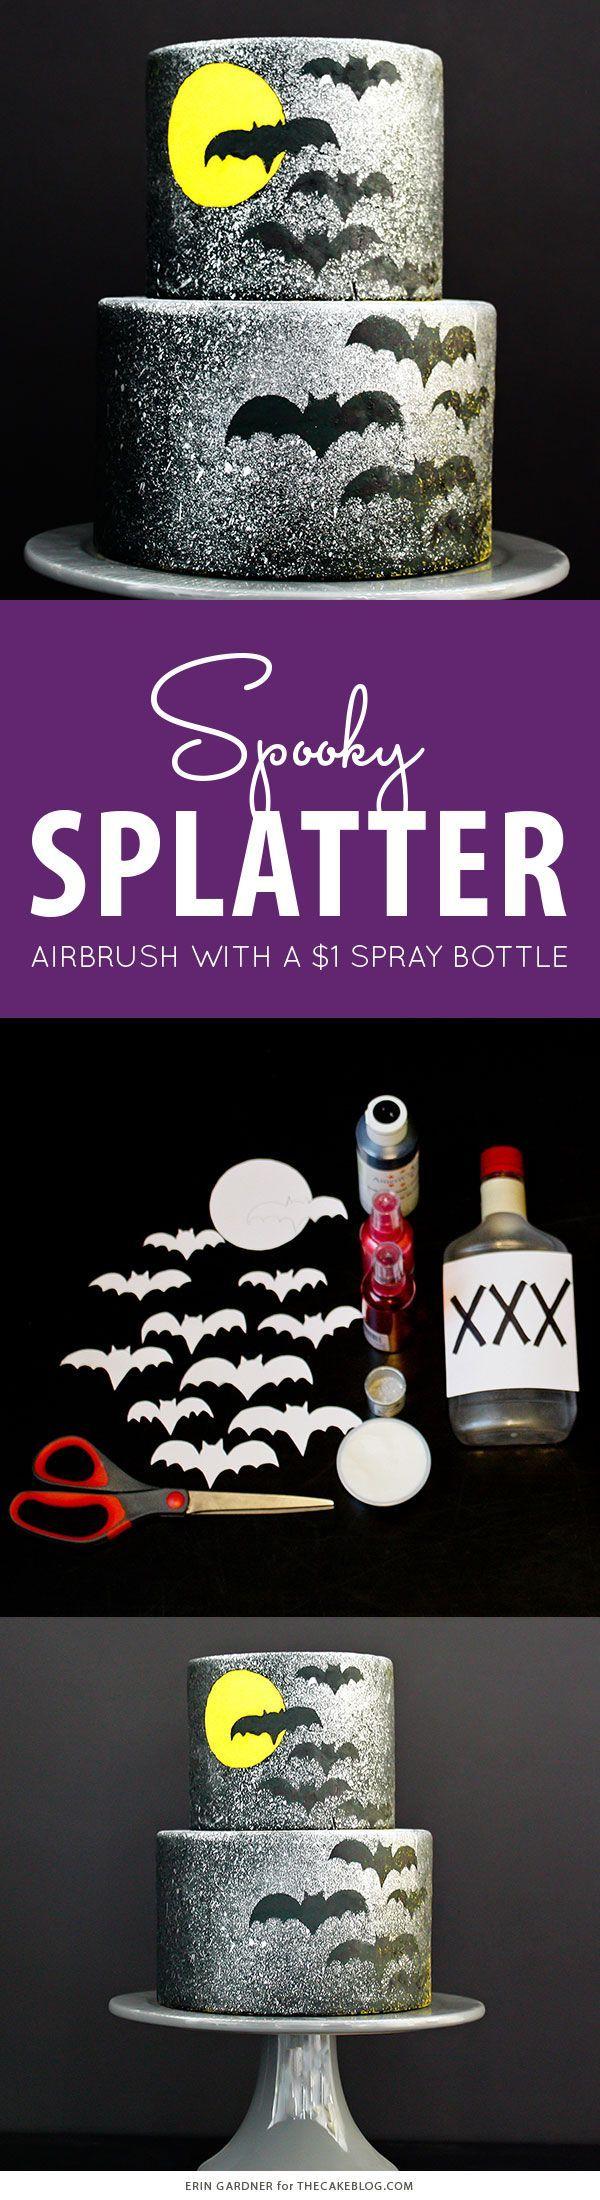 Spooky Splatter Halloween Cake - how to airbrush with a $1 spray bottle  |  Erin Gardner for TheCakeBlog.com